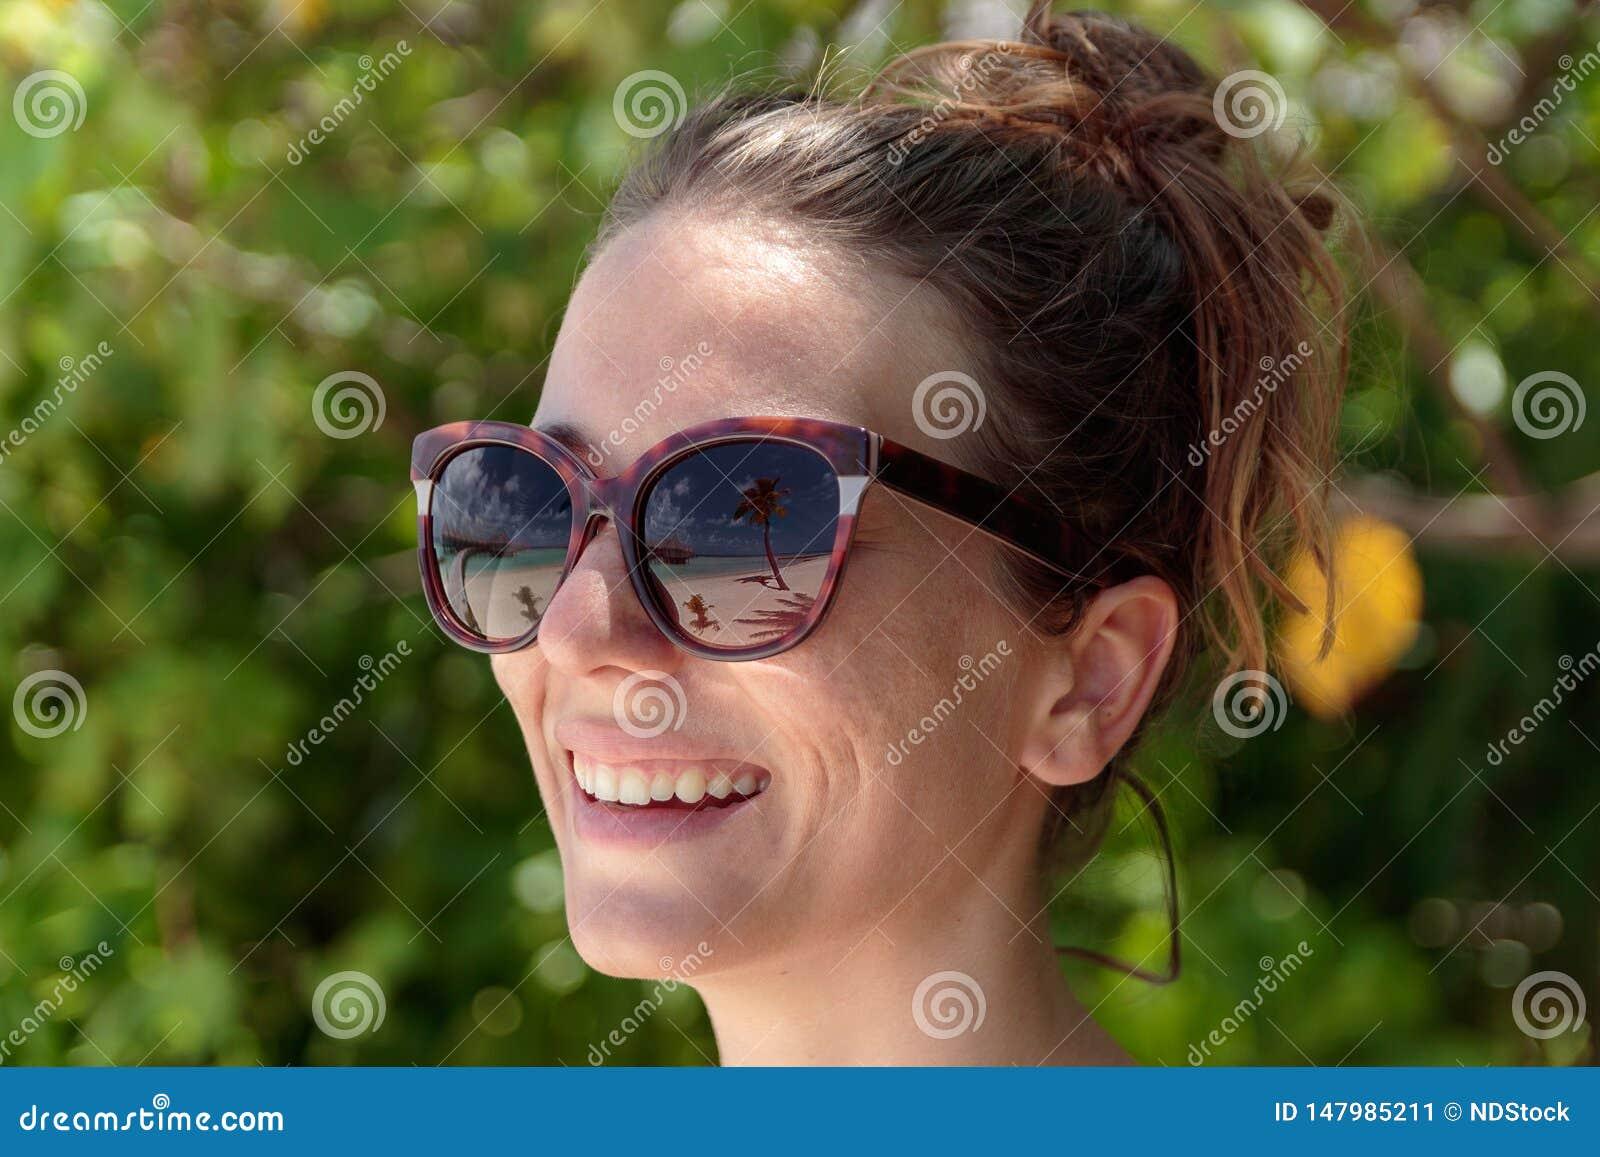 Palma, spiaggia bianca ed acqua blu cristallina riflesse negli occhiali da sole di una donna felice maldives